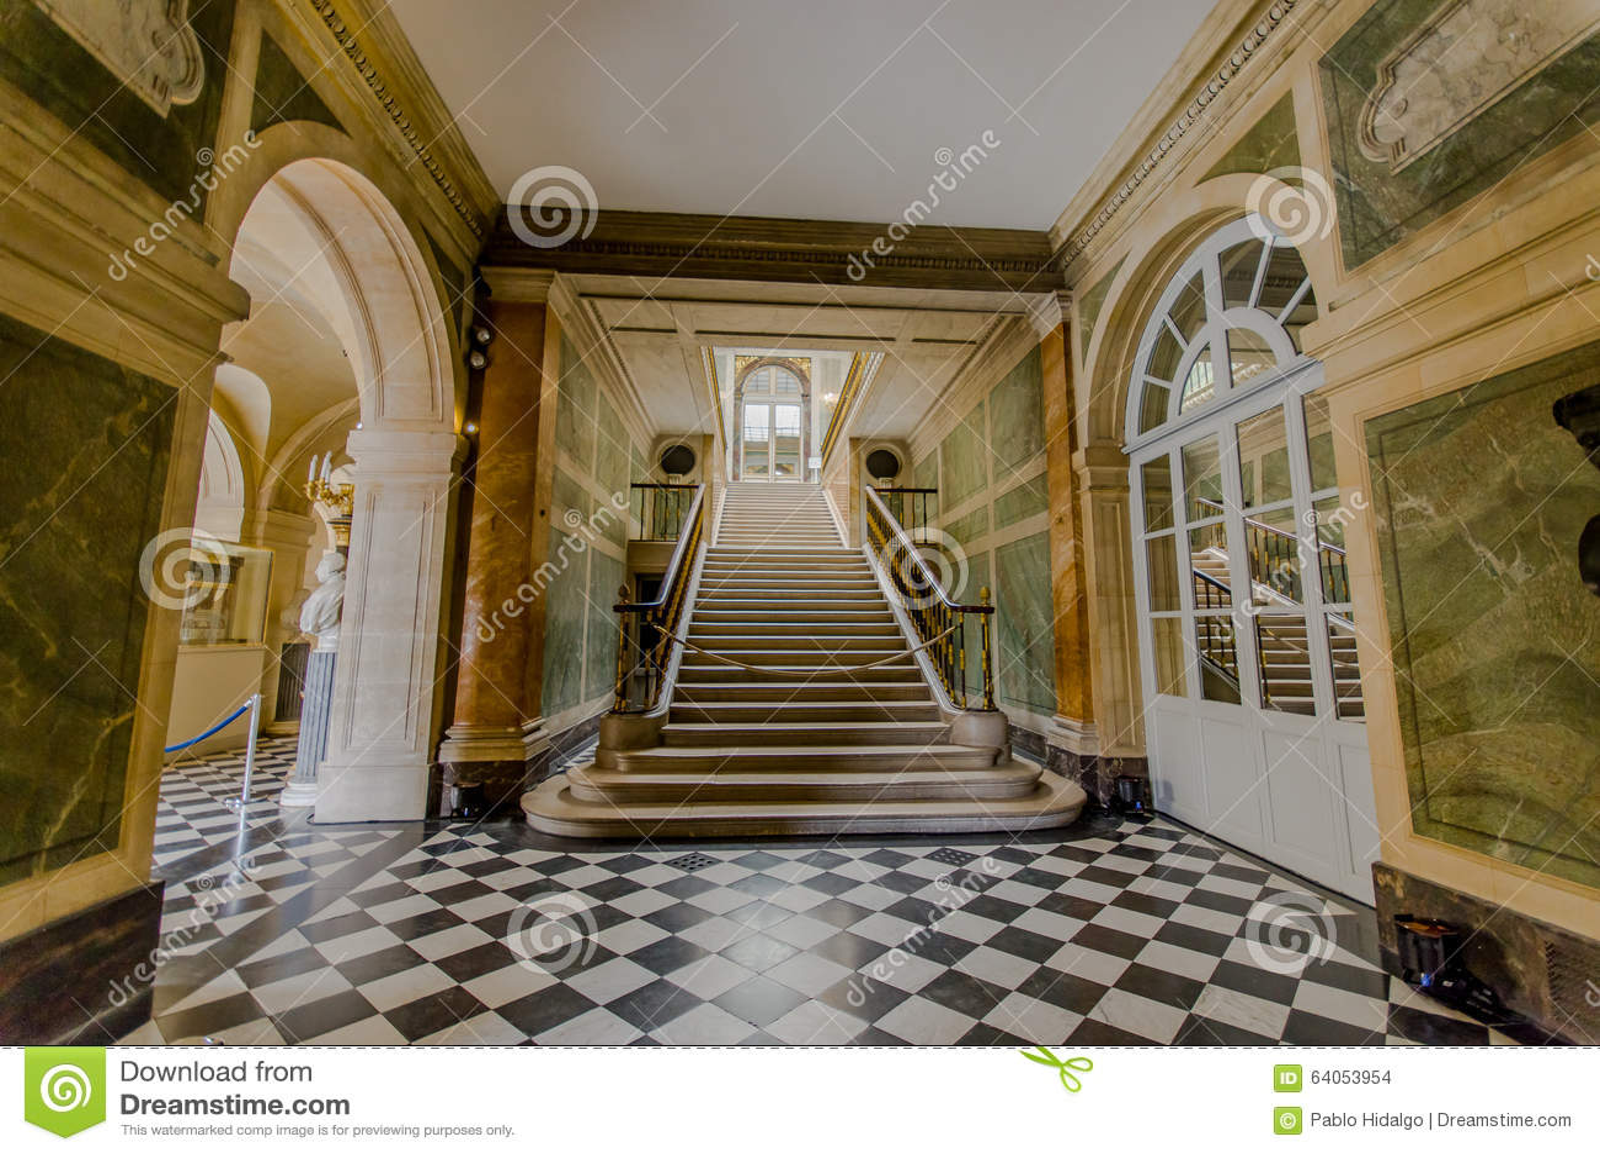 Interiors of chateau de versailles near paris editorial for Interior site